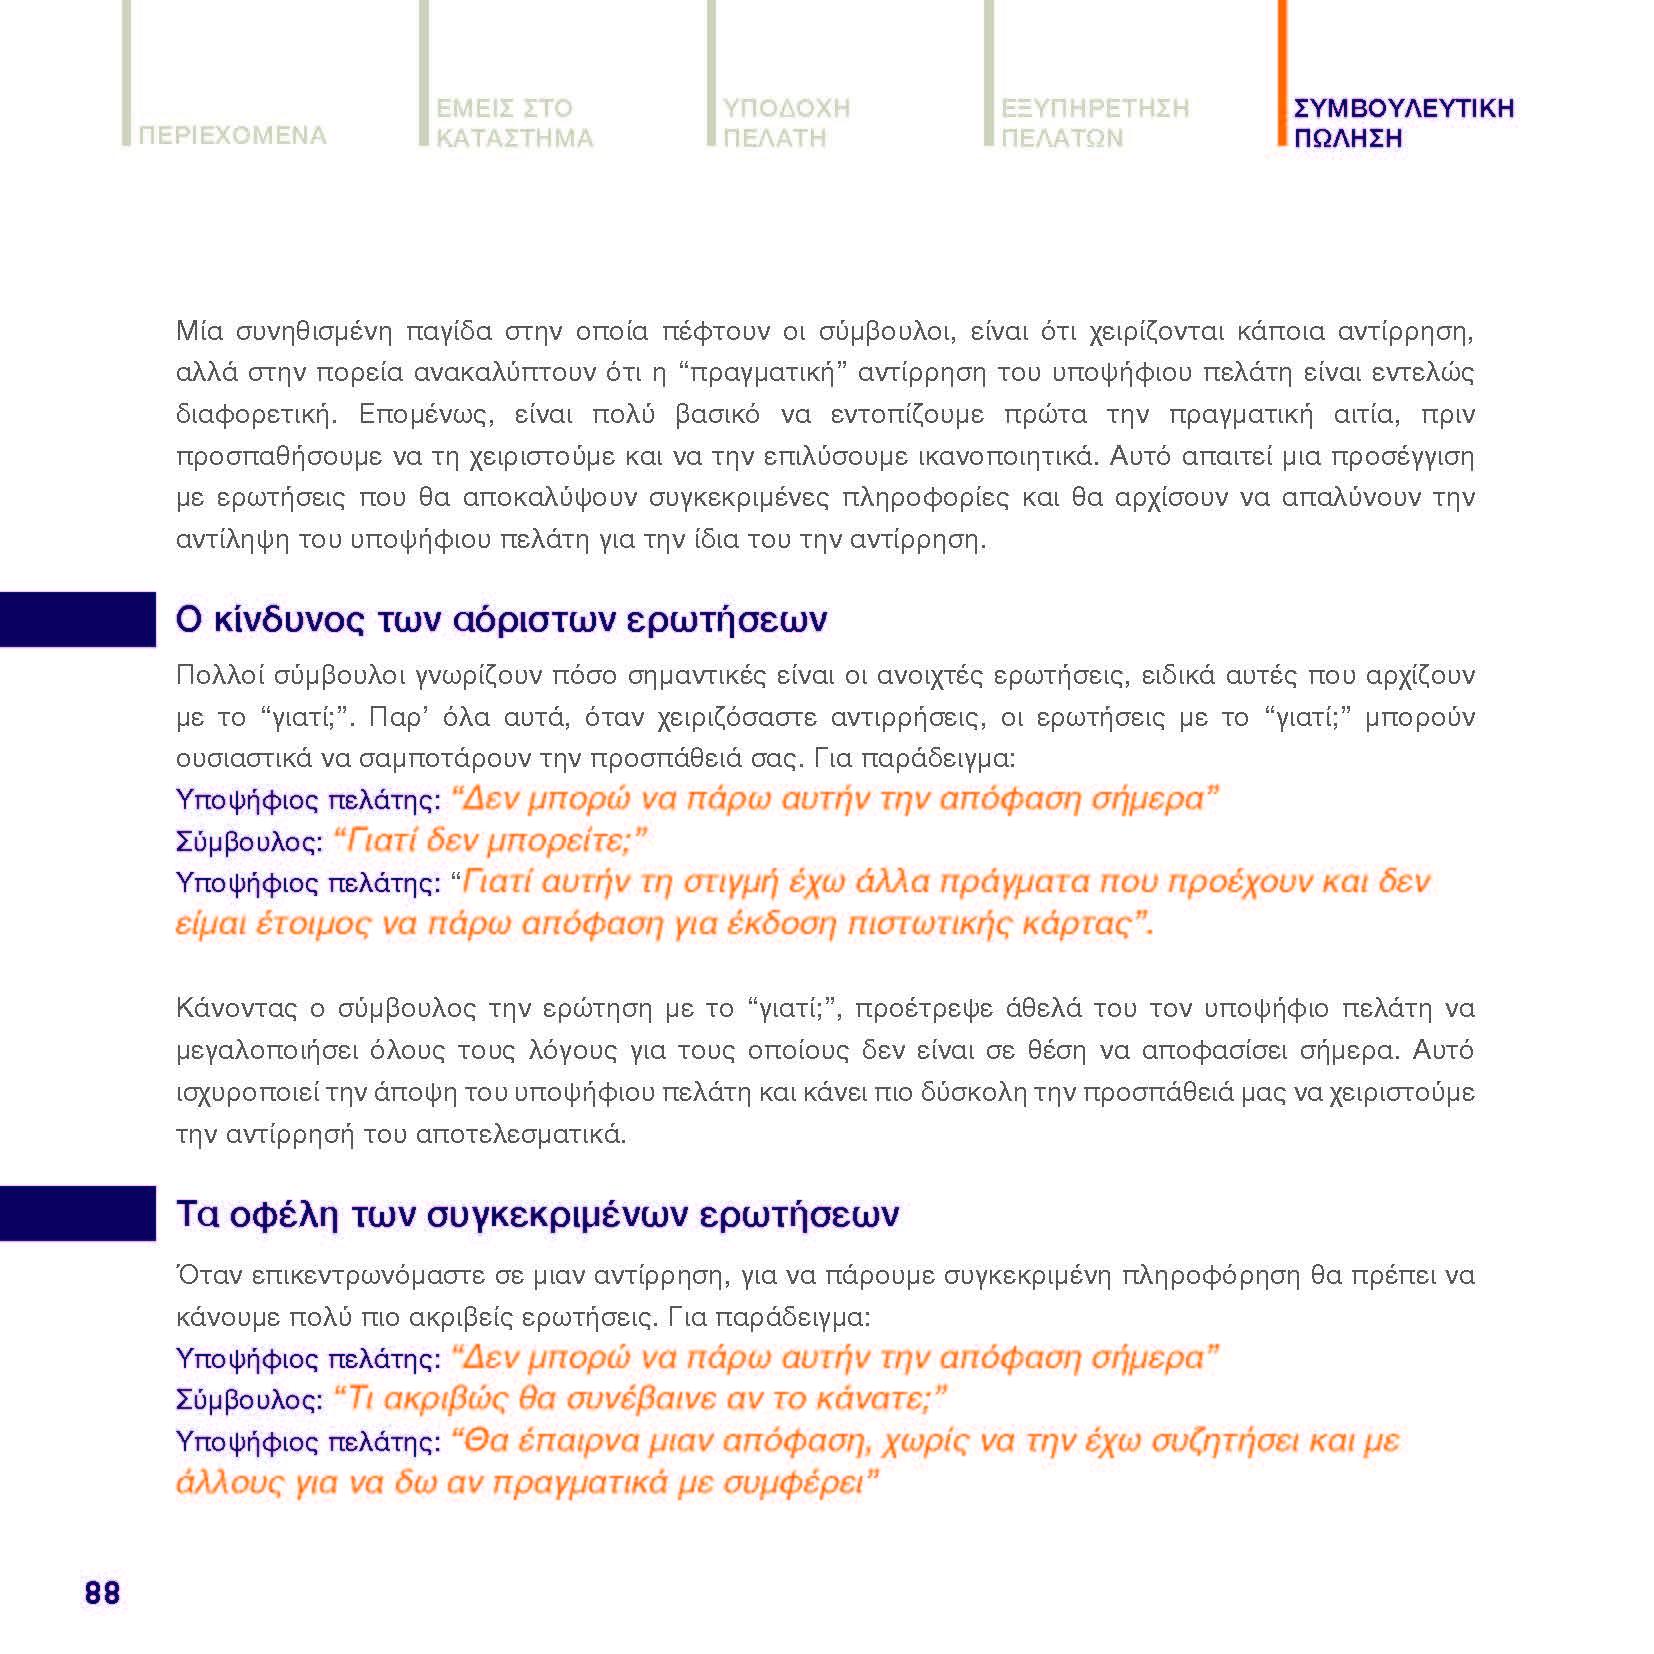 https://www.jib.gr/wp-content/uploads/2020/09/OPTIMA-BANK-BOOKLET-WEB_Page_088.jpg